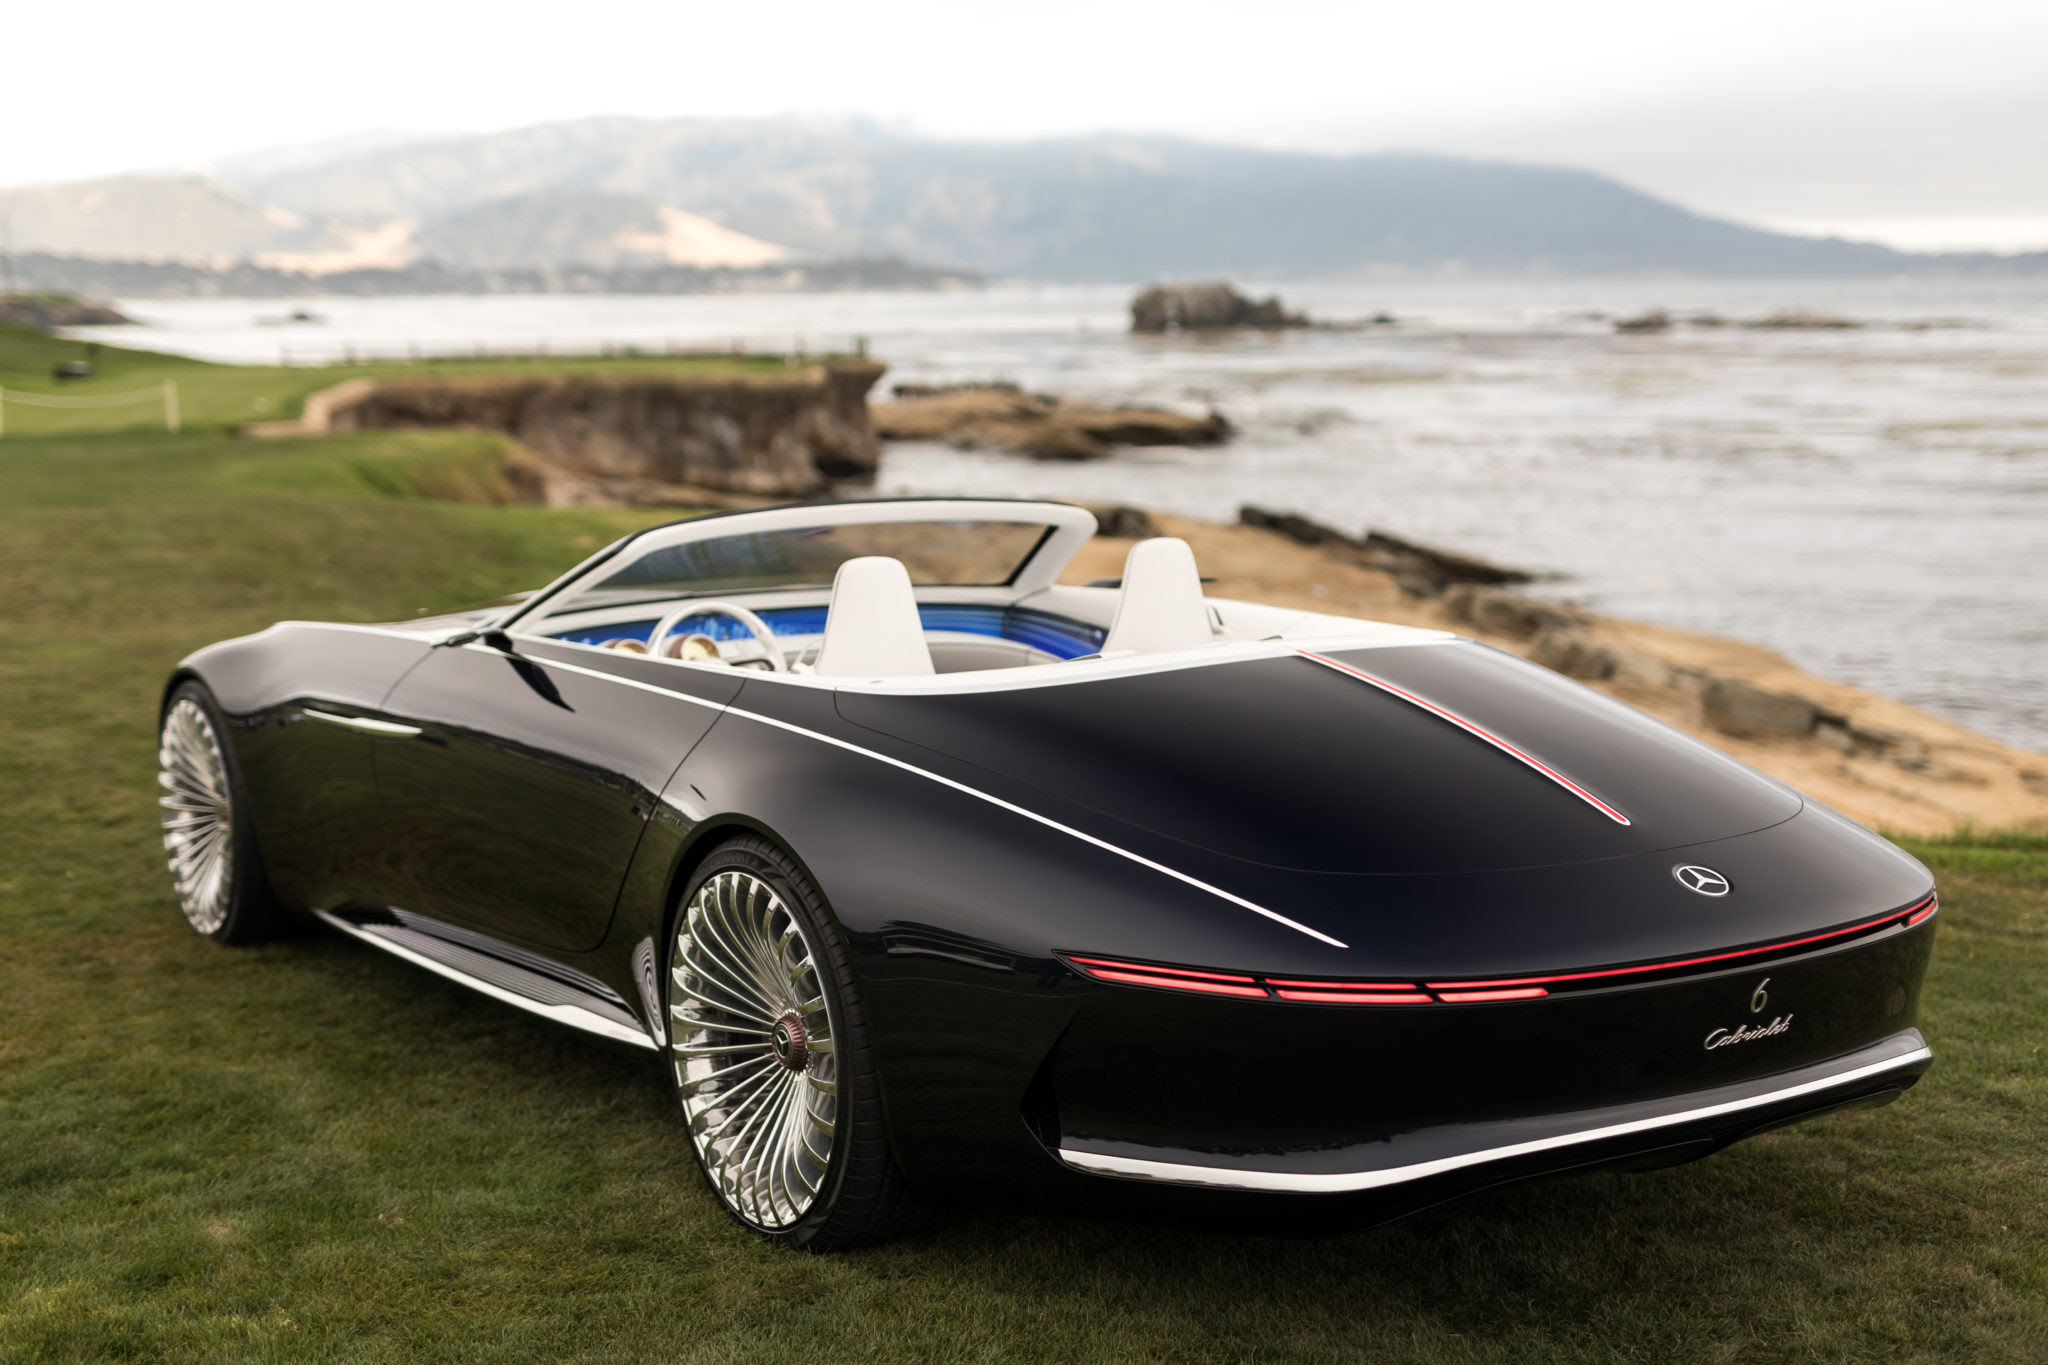 Vision Mercedes-Maybach 6 Cabriolet - LUXUO